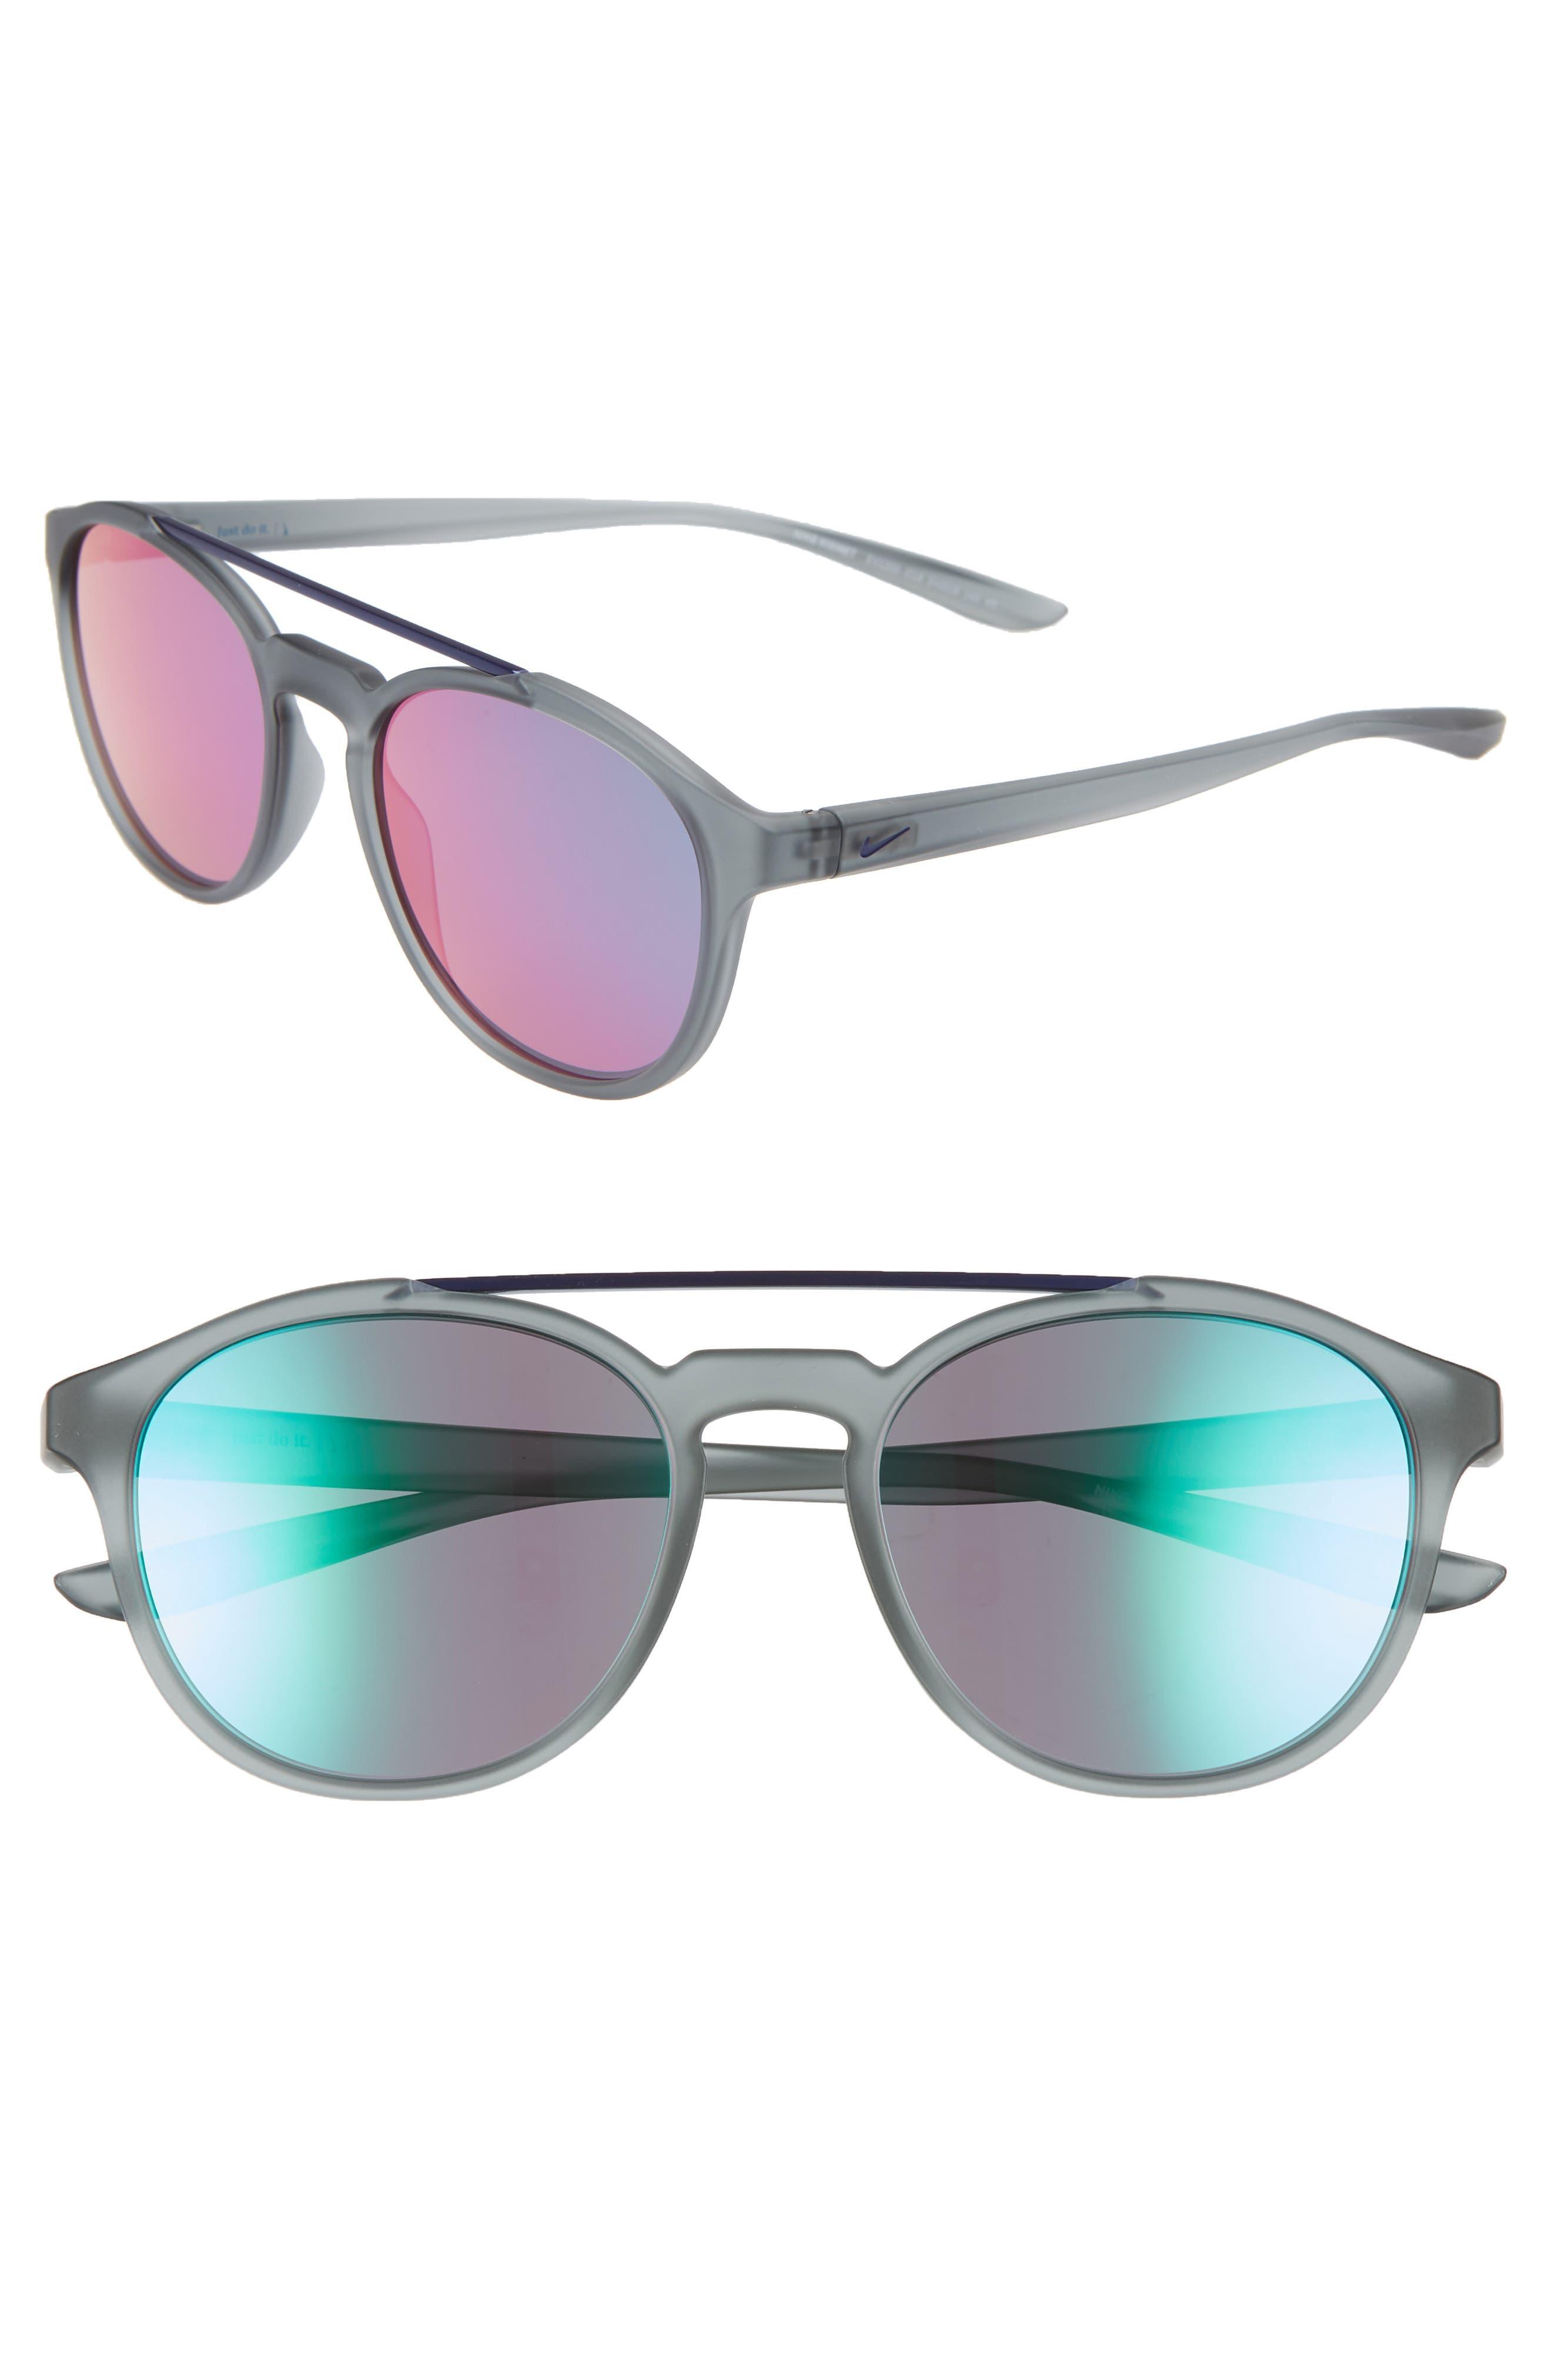 Nike Kismet 5m Round Sunglasses - Matte Cool Grey/ Teal